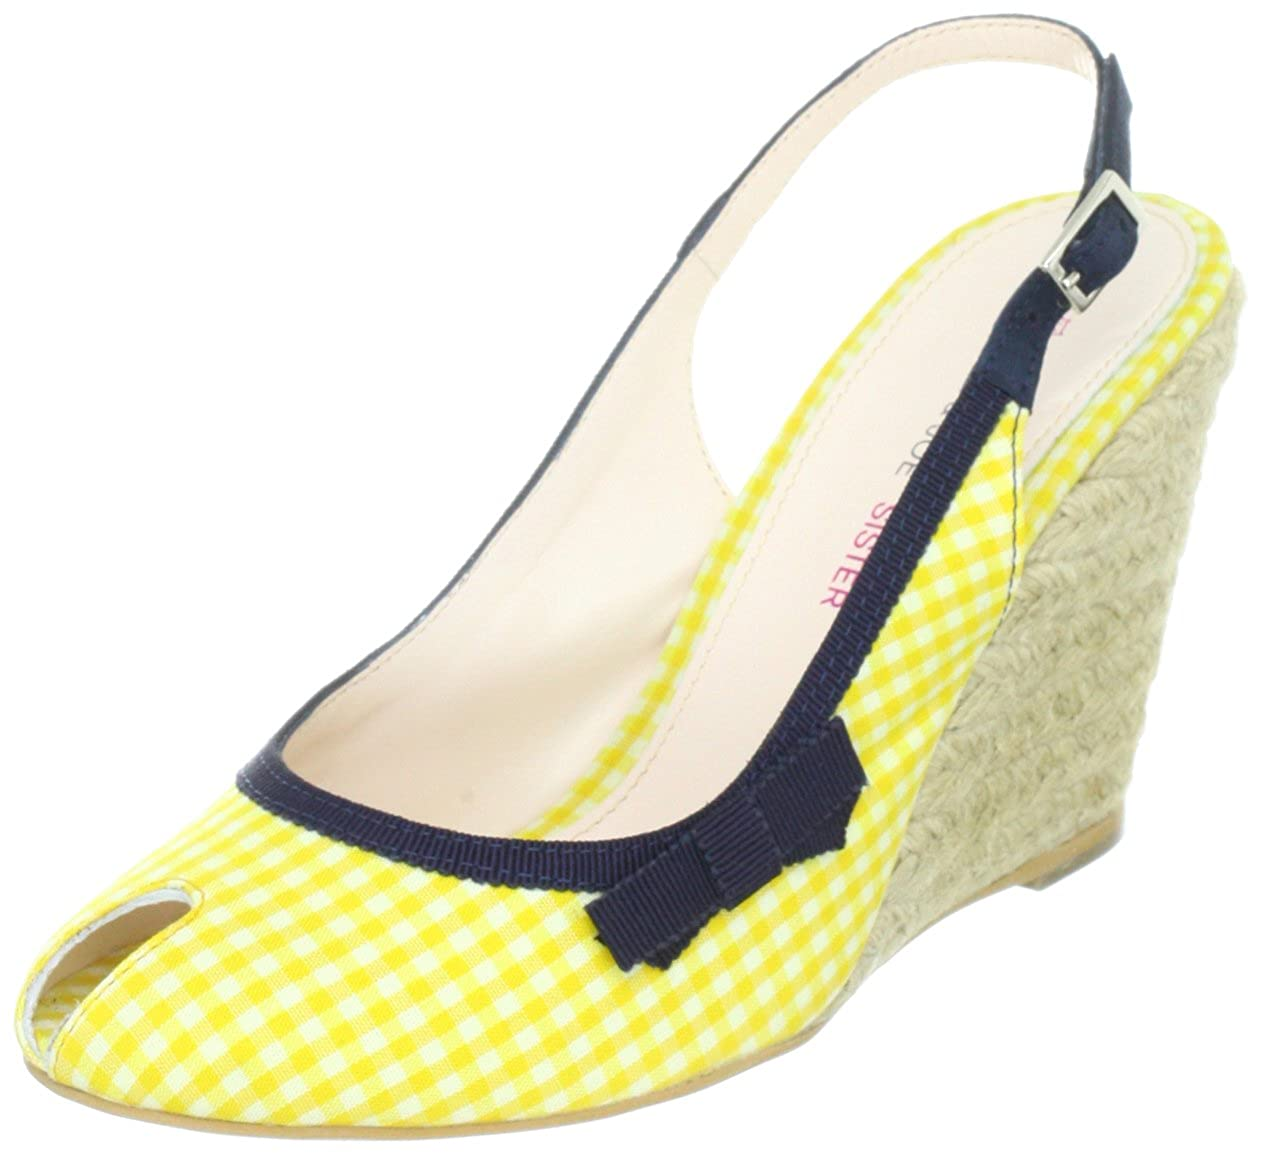 Para De Sister Joe amp; Zapatos Paul Lona Mujer 212892 Lola 50 0zUFWgnaW